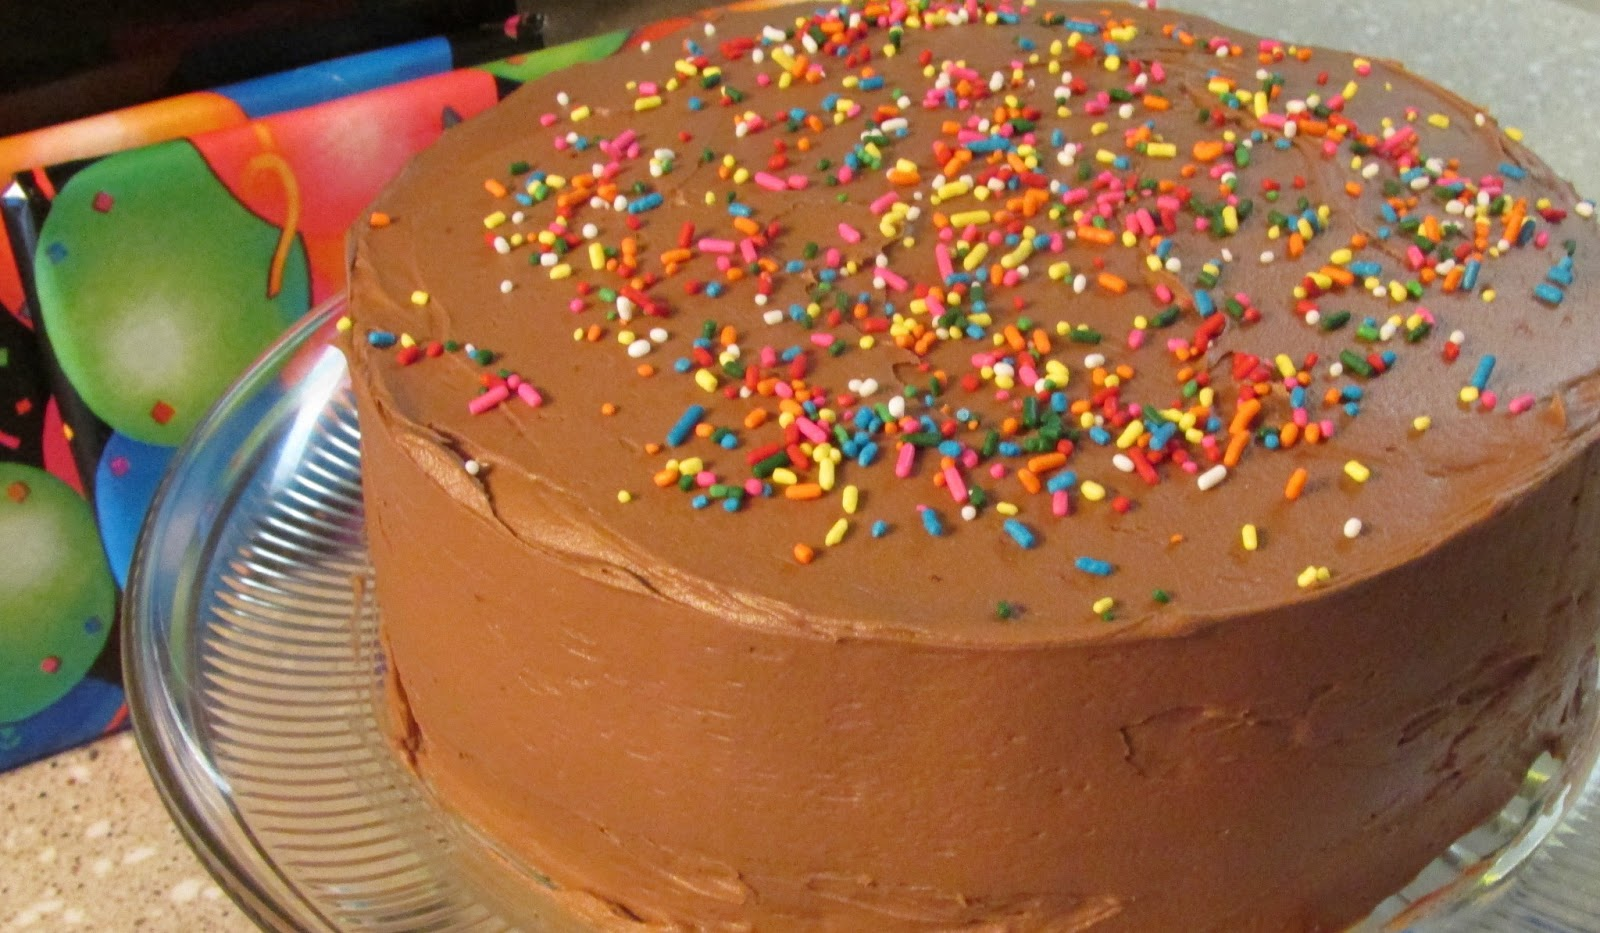 Baker Becky Chocolate Chocolate Cake